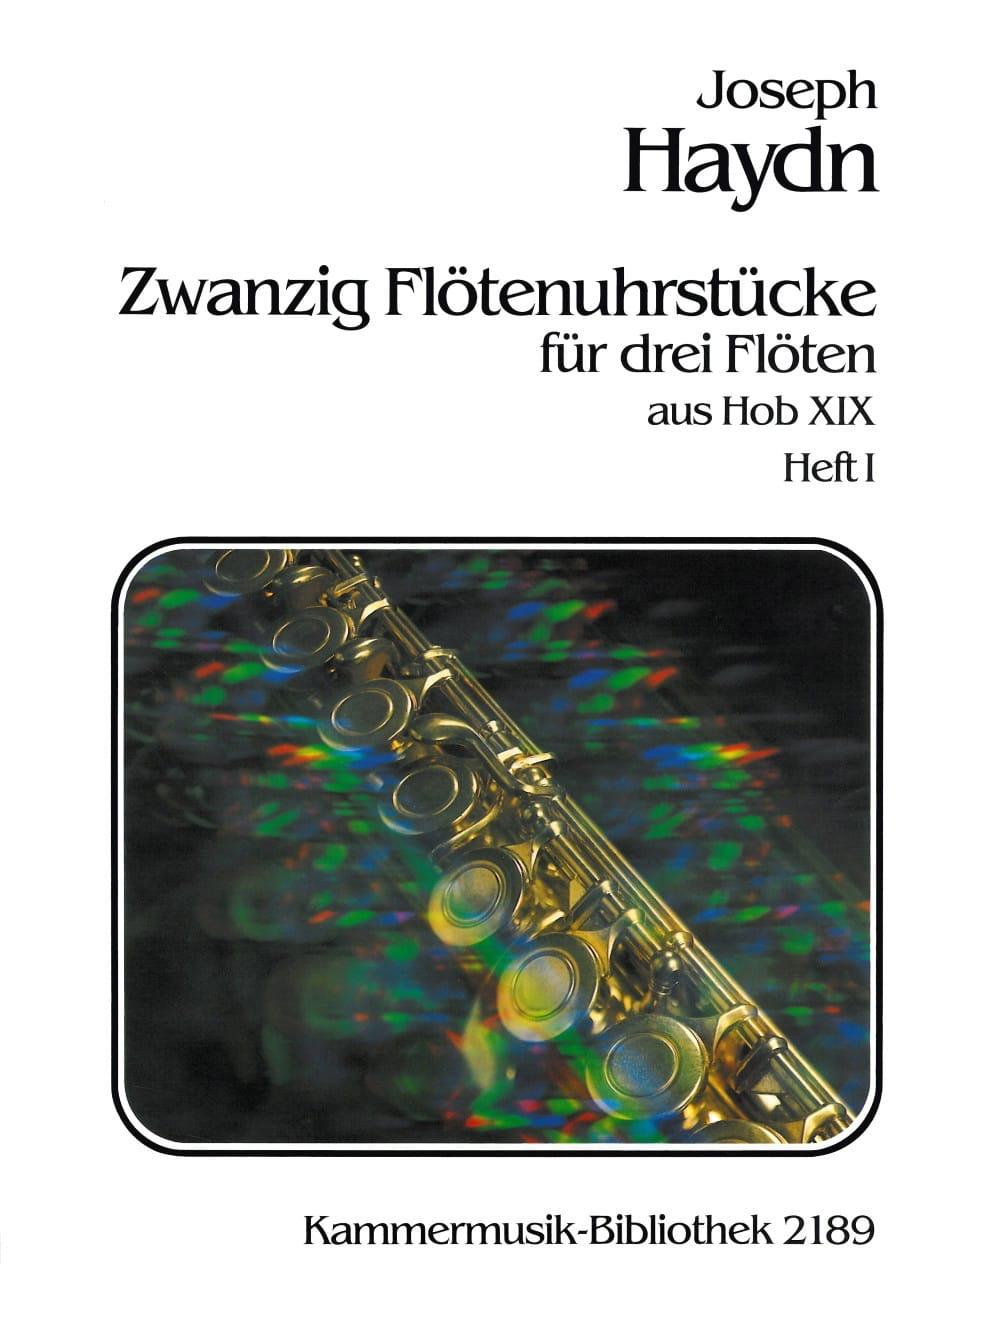 20 Flötenuhrstücke Aus Hob. 19 Heft 1 - 3 Flöten - laflutedepan.com